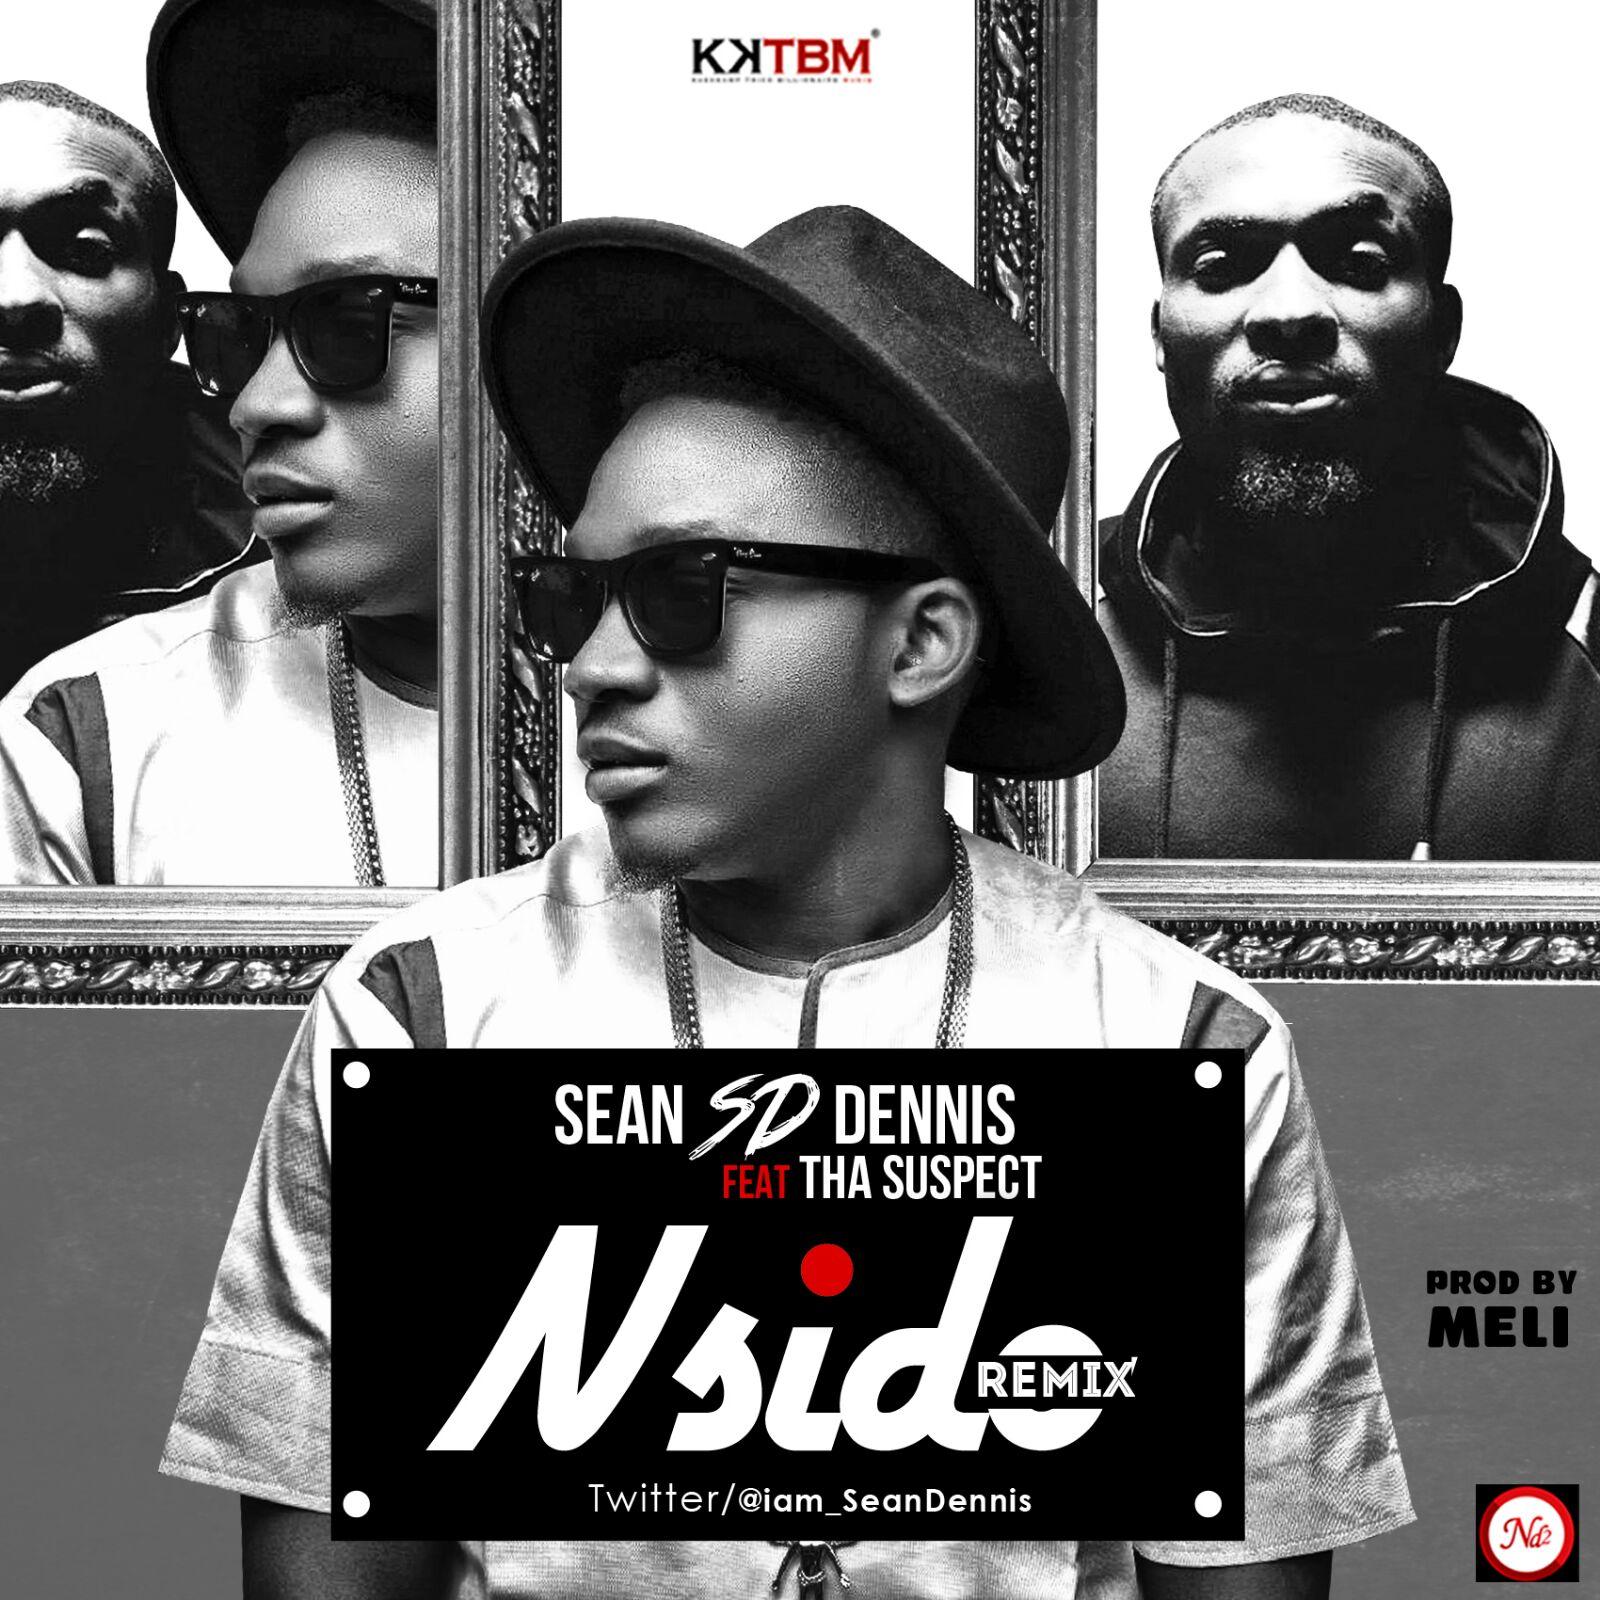 S.D ft. Tha Suspect - Nsido (Remix)